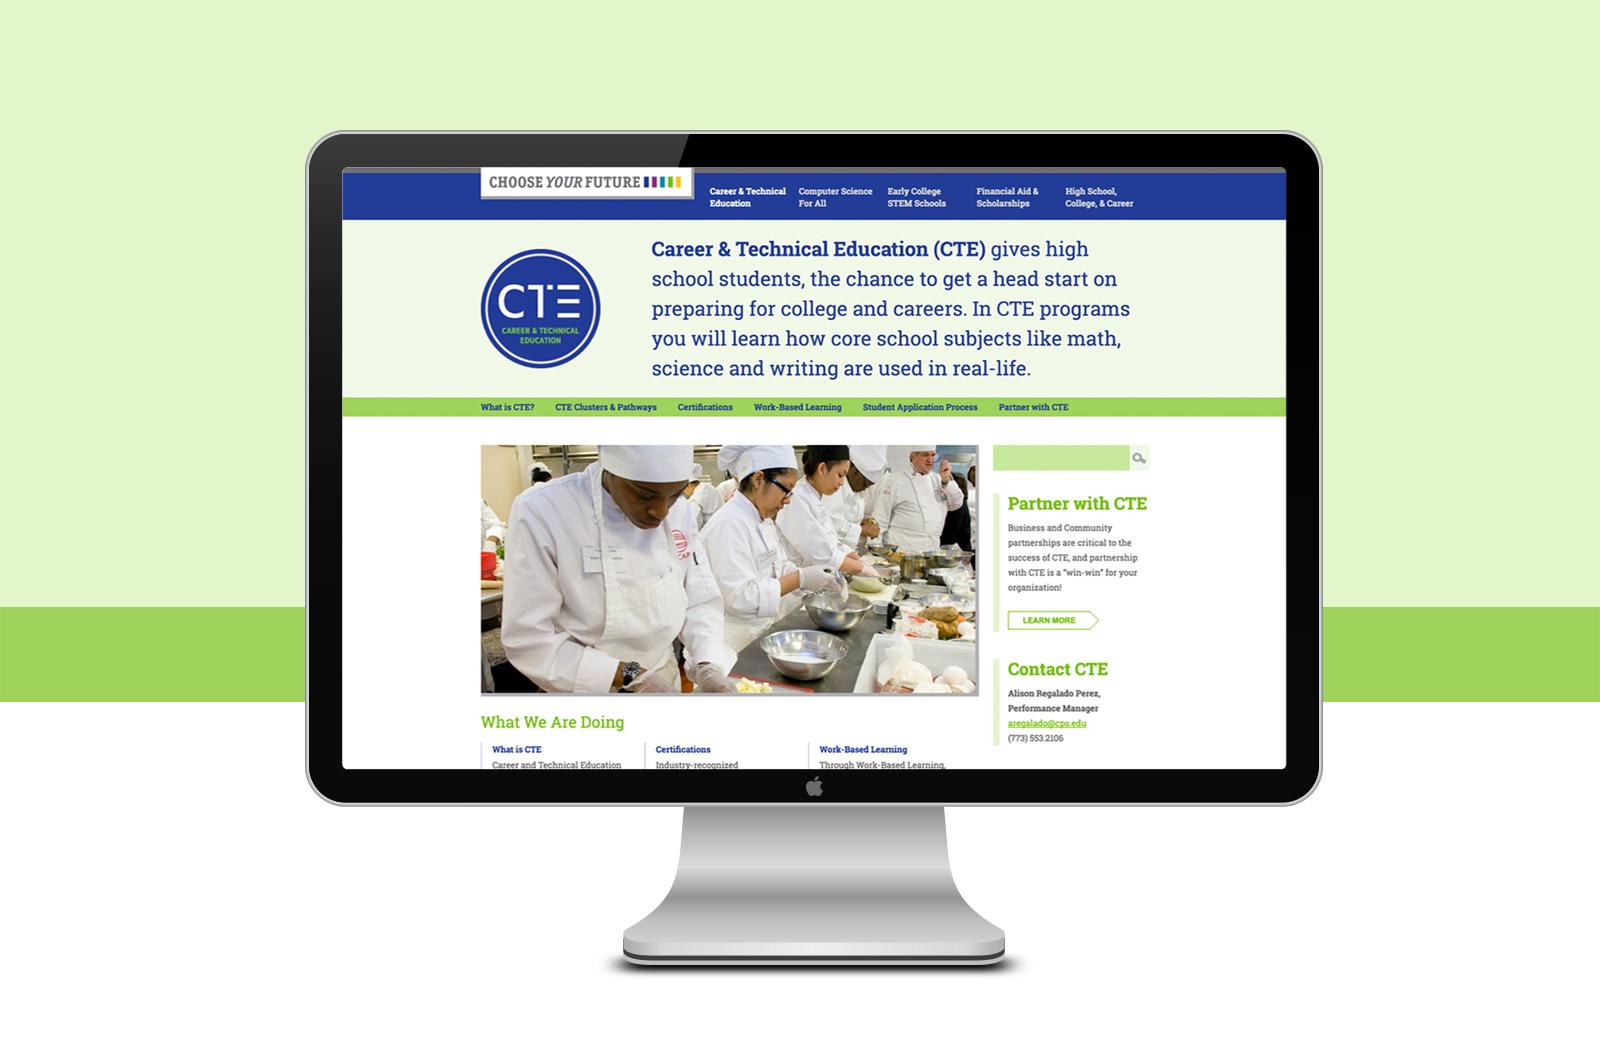 Choose Your Future Website Image